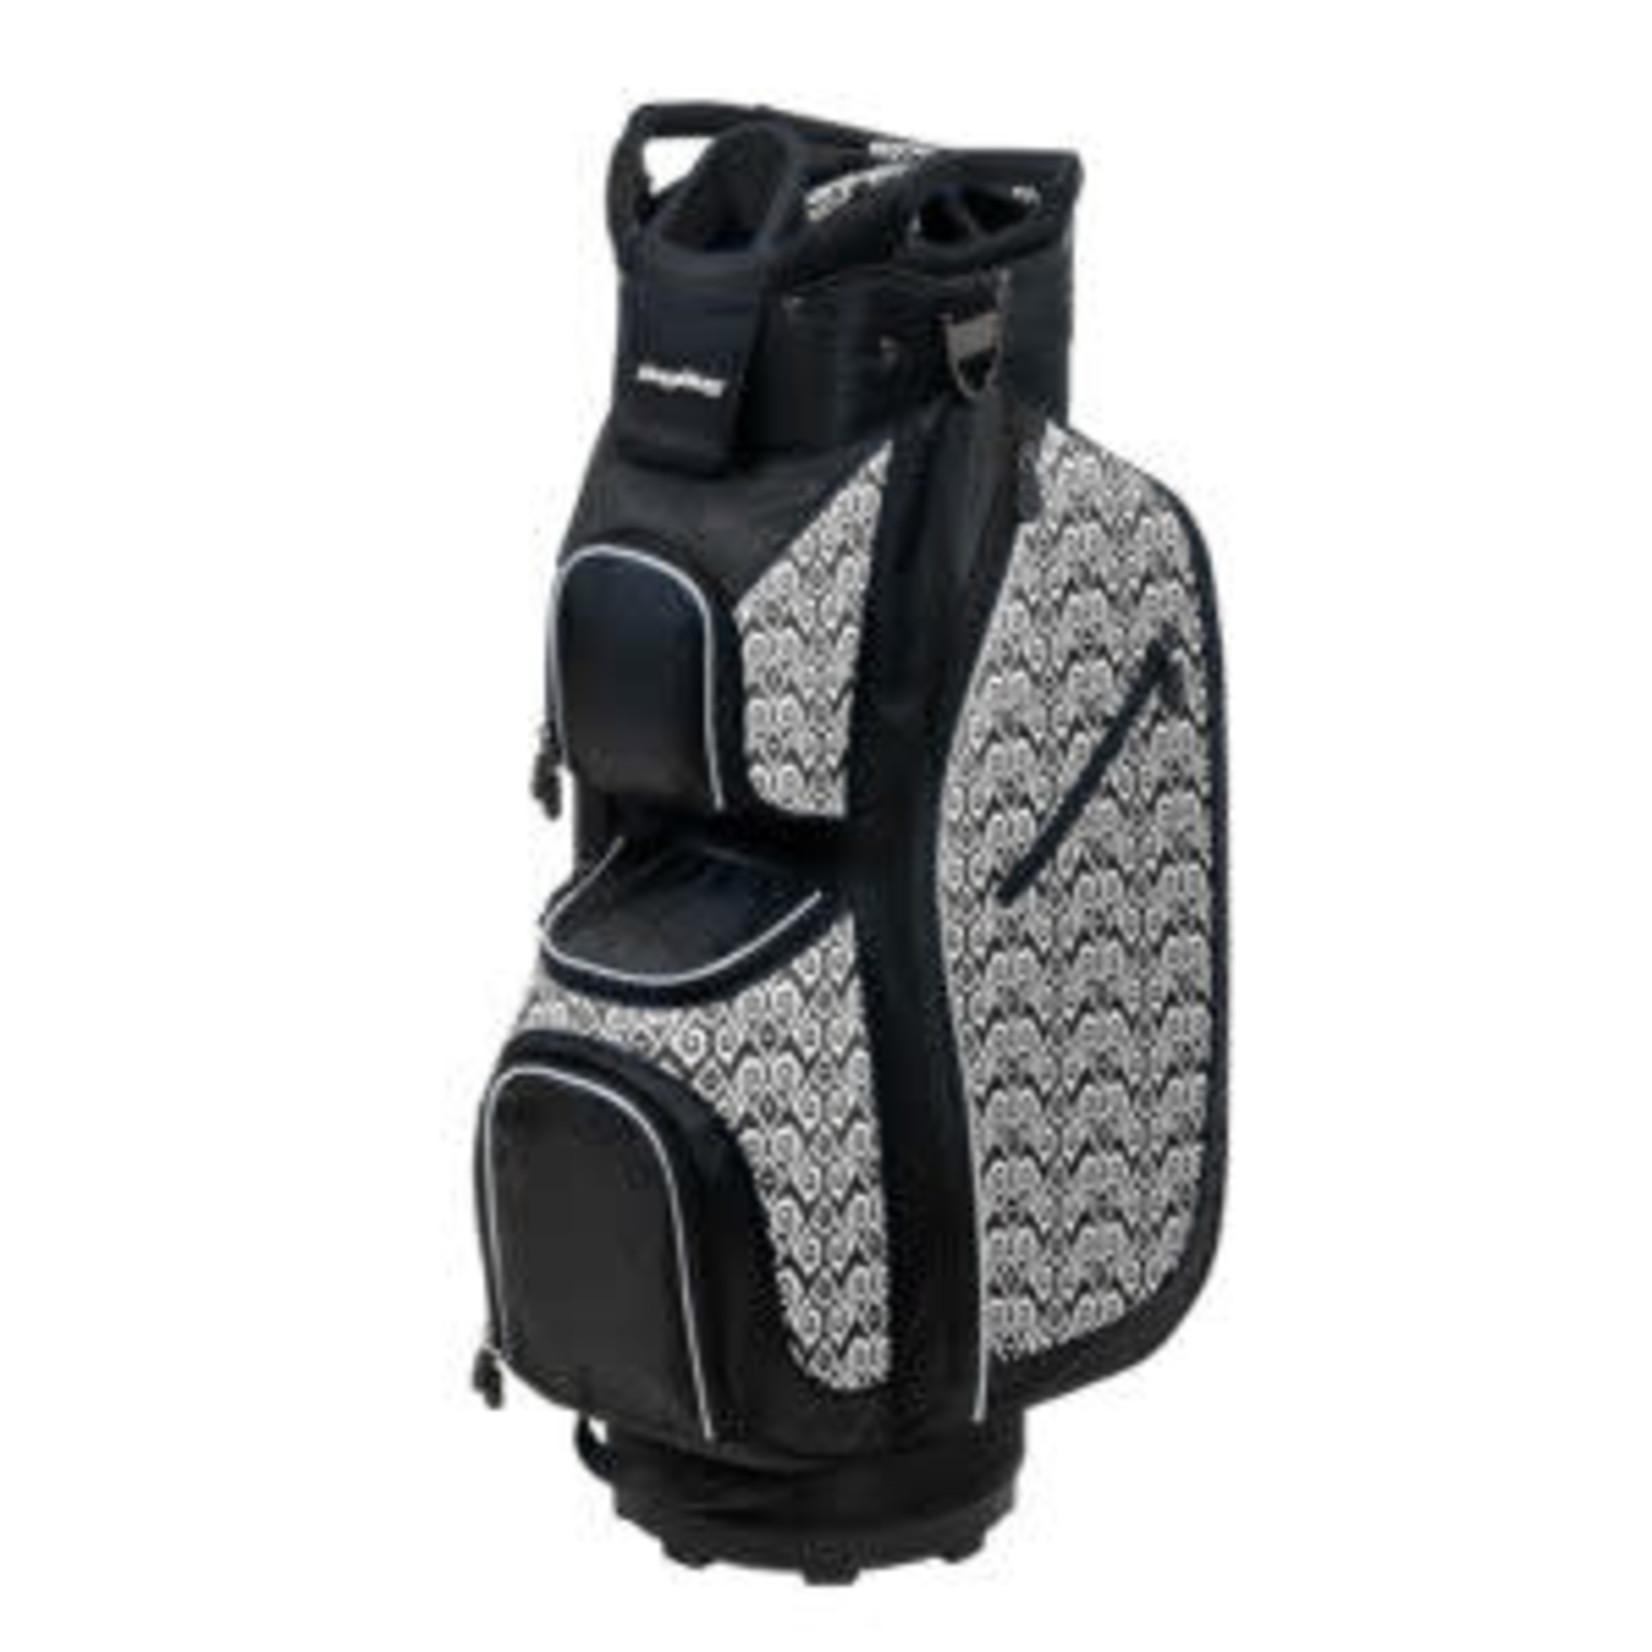 BagBoy Bagboy LDX Plus Cartbag Black/White/Celtic arrows